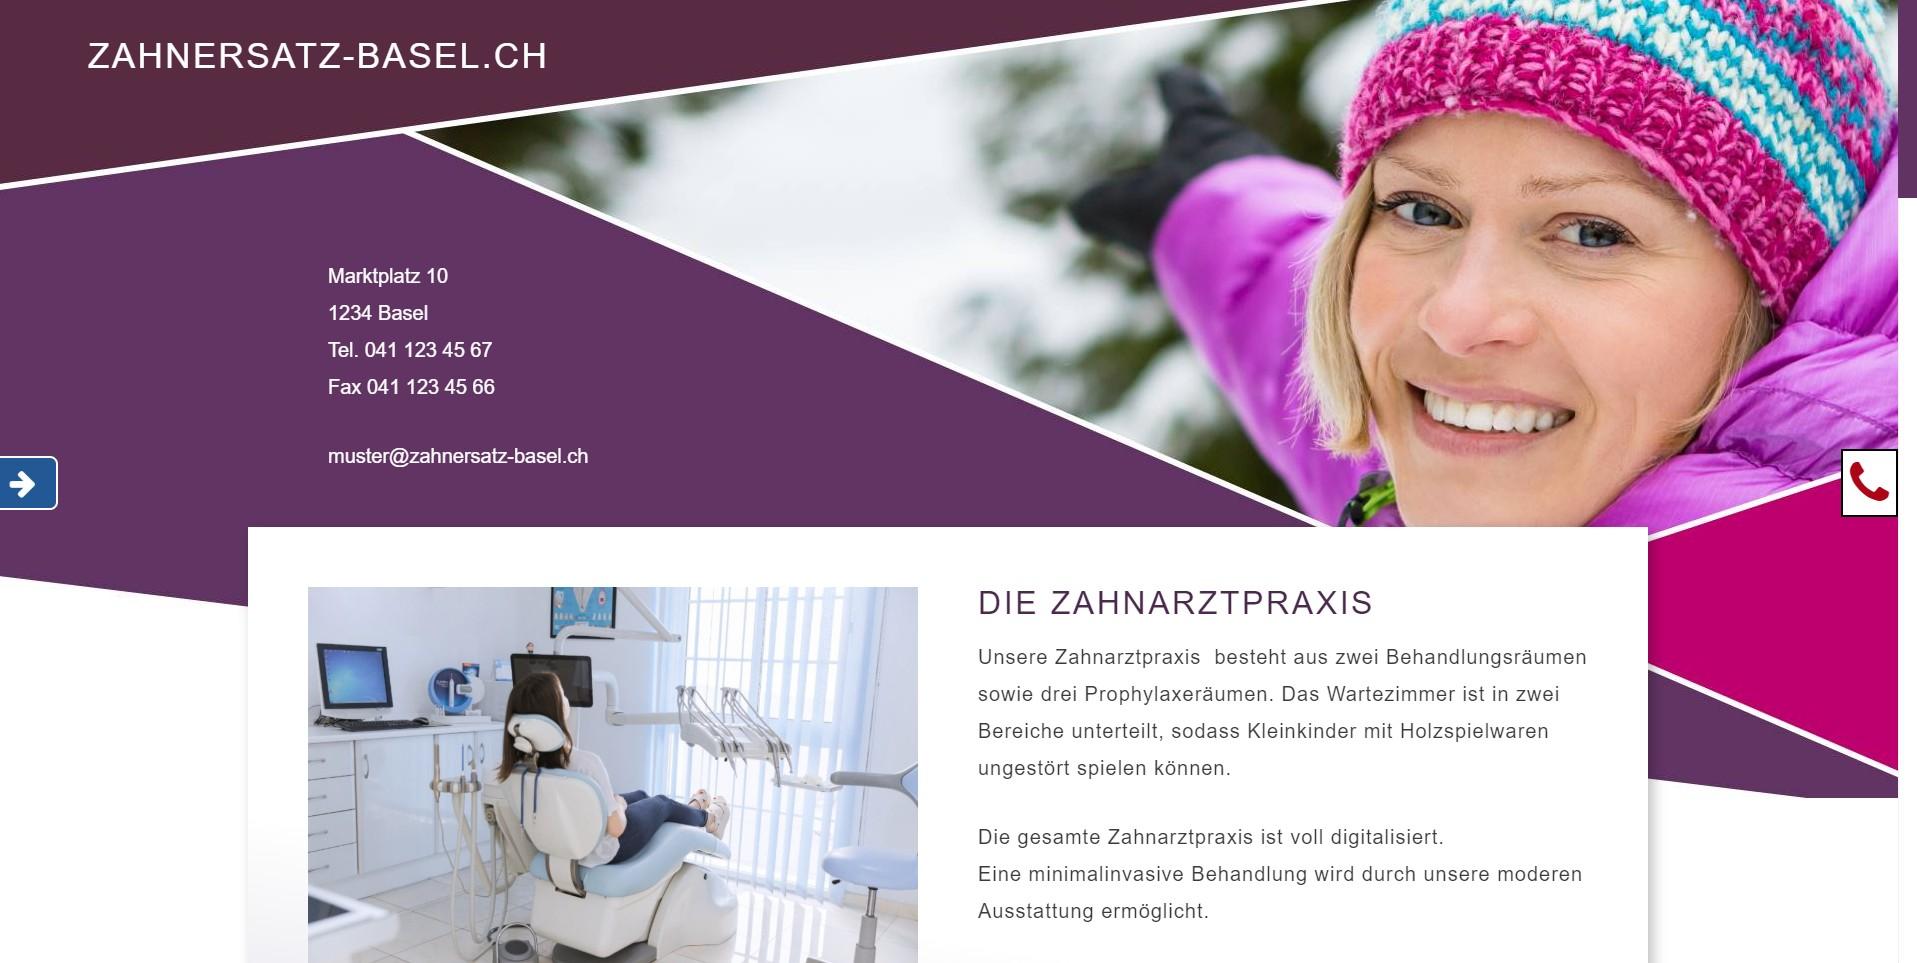 Zahnersatz-Basel.ch